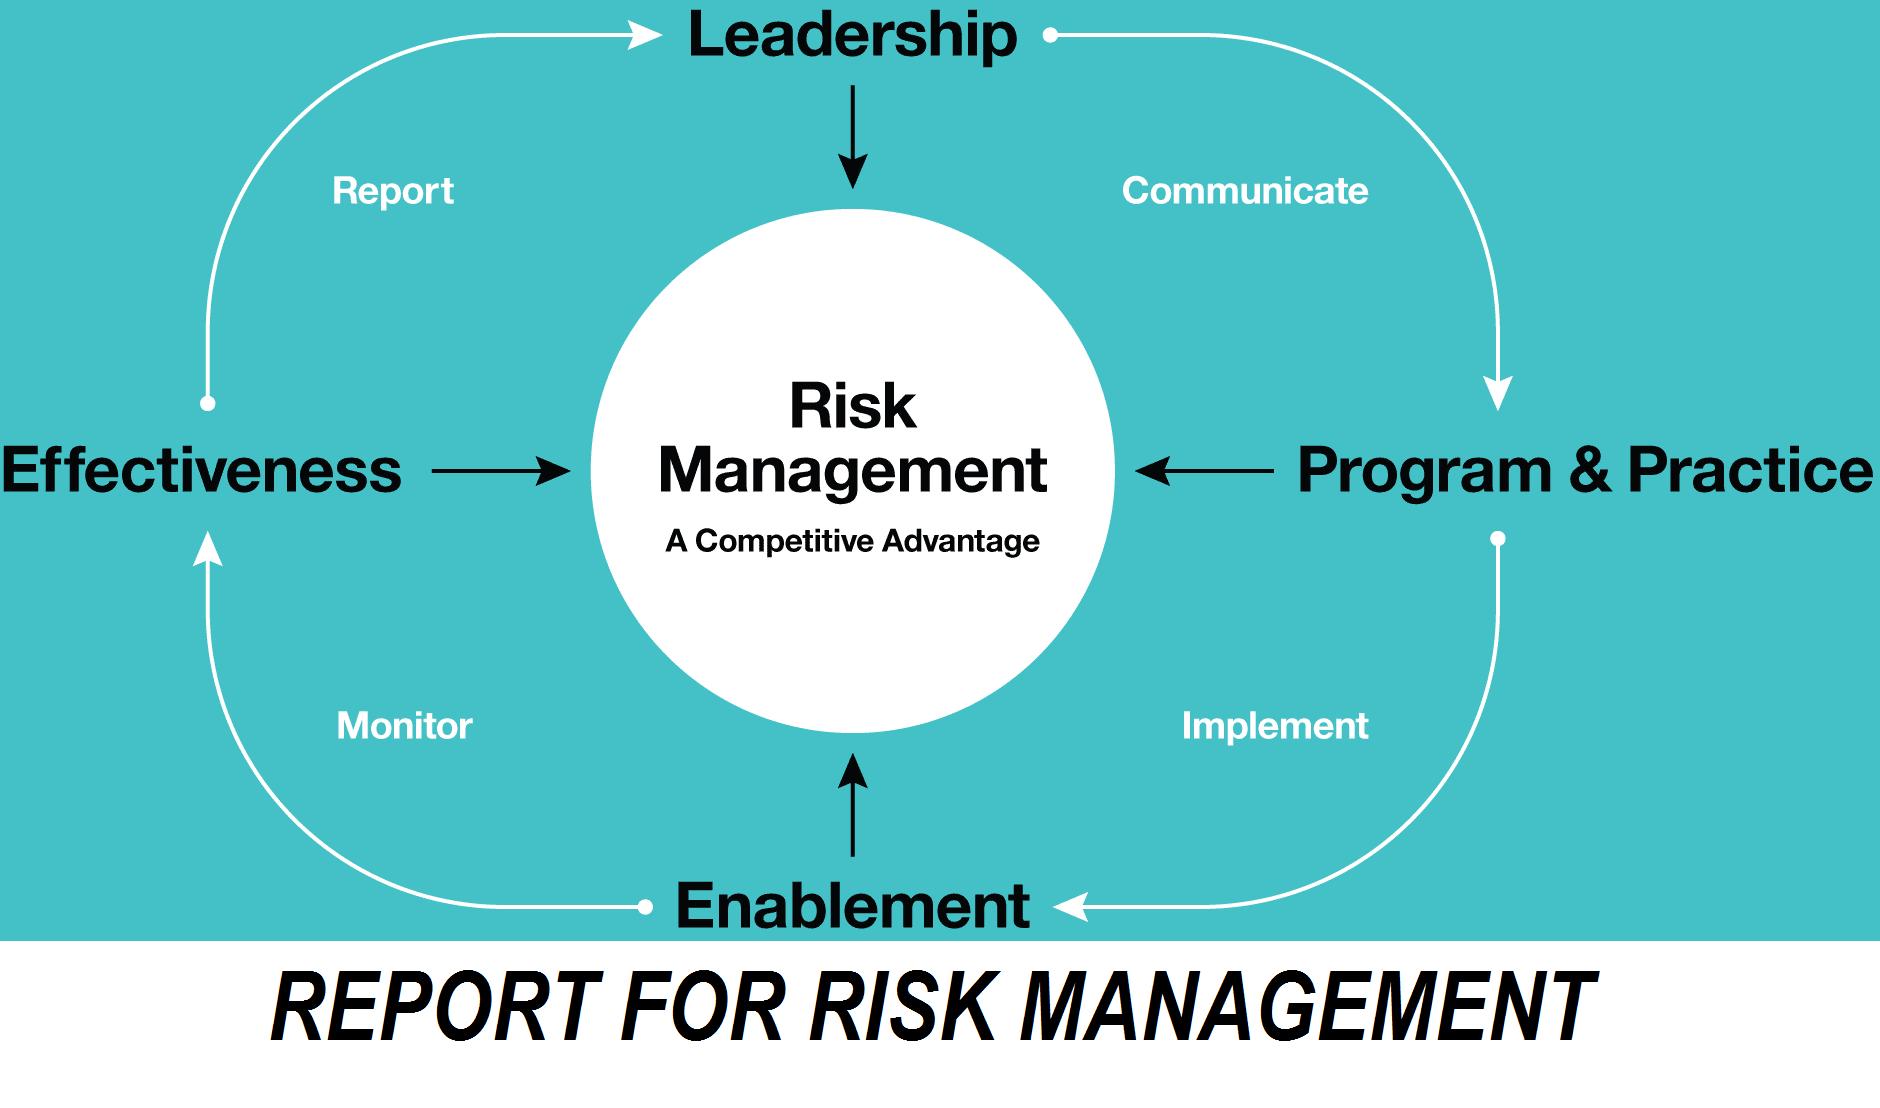 REPORT FOR RISK MANAGEMENT